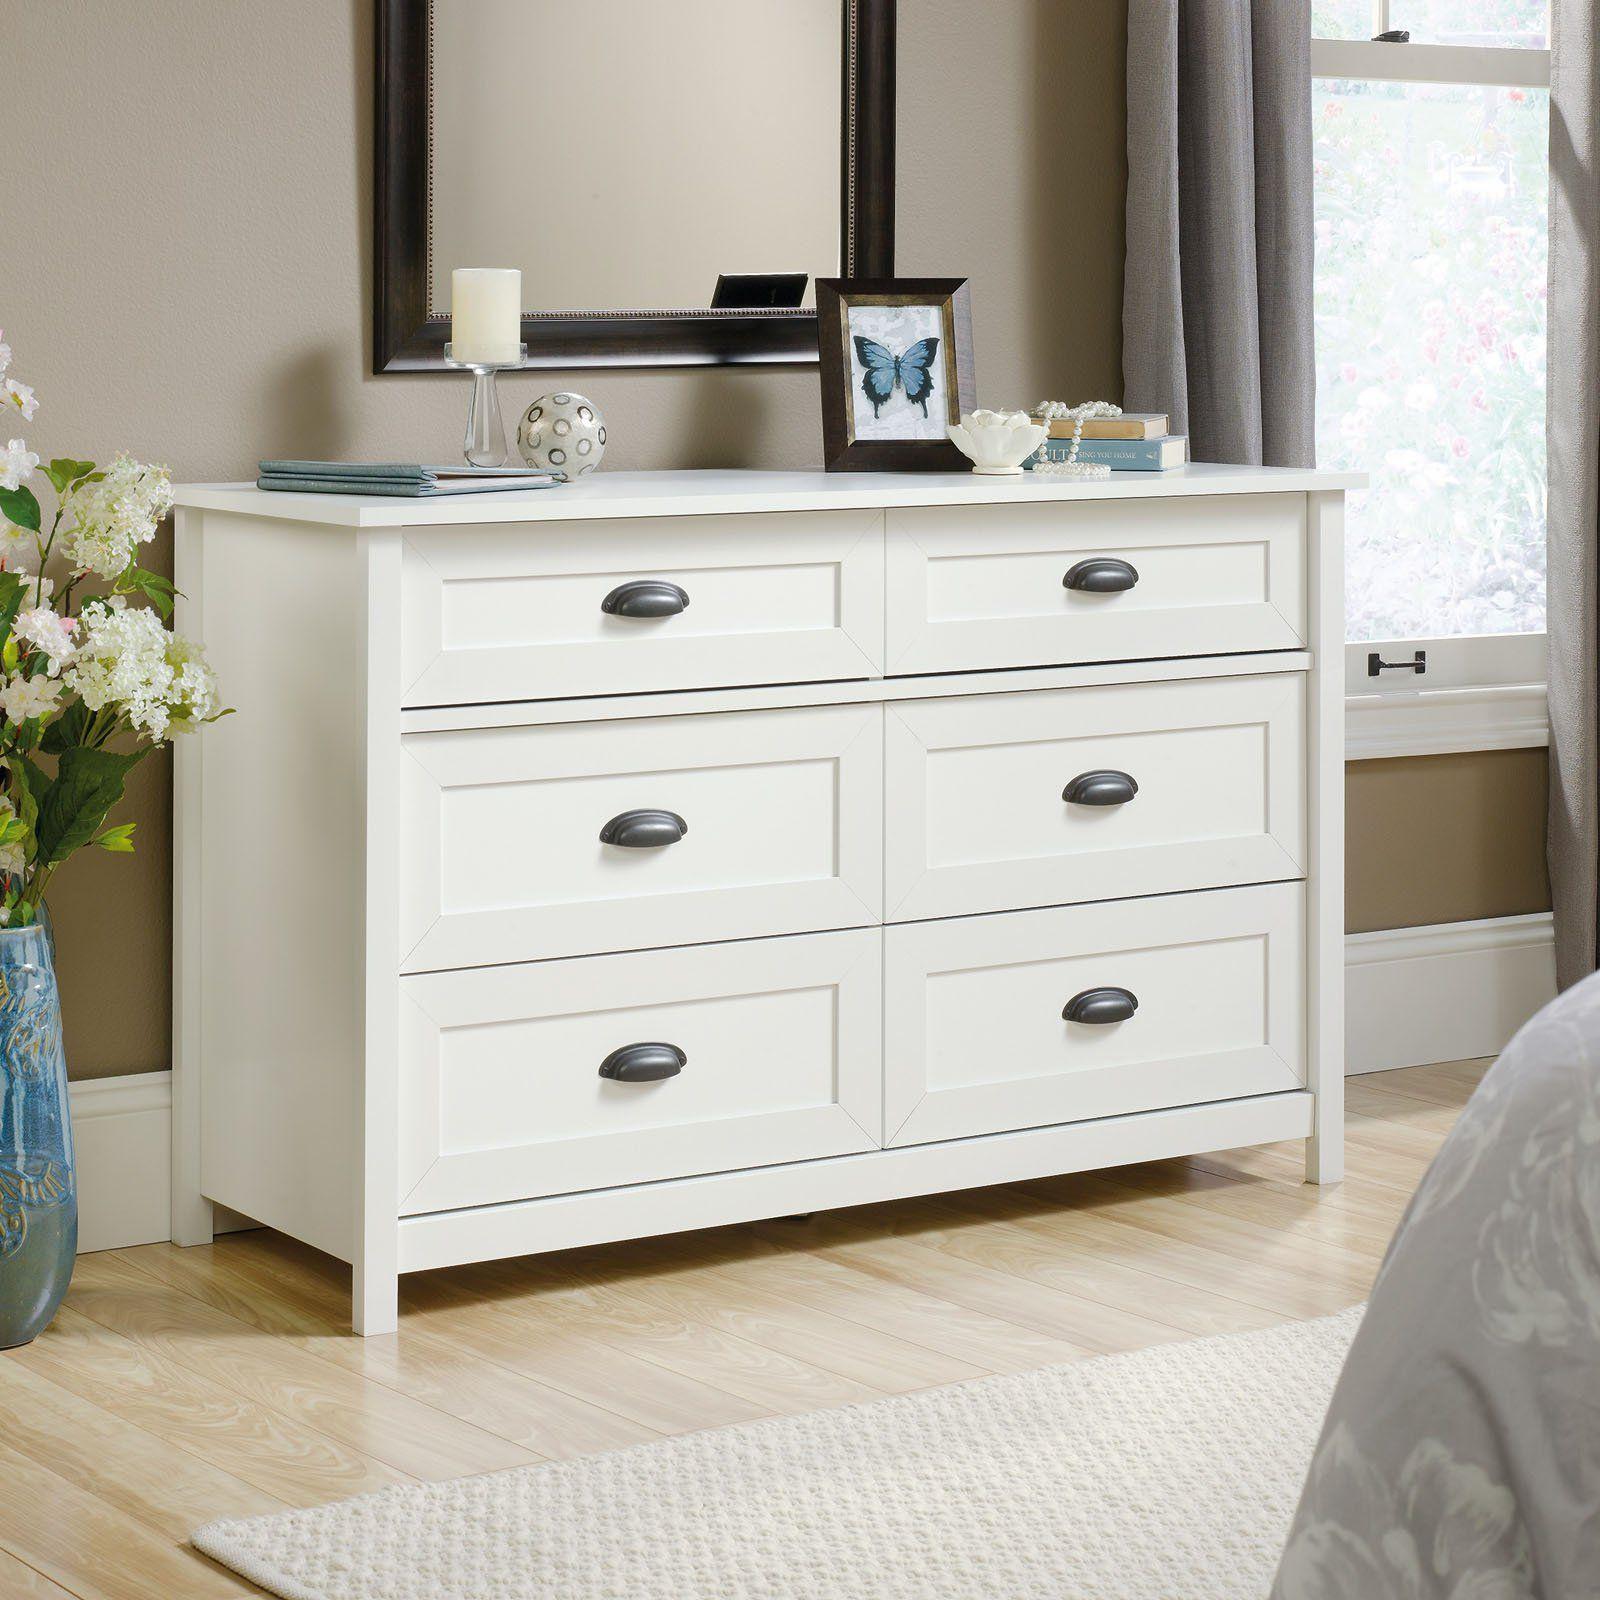 Sauder County Line 6 Drawer Dresser White 6 Drawer Dresser Dresser Drawers 6 Drawer Dresser [ 1600 x 1600 Pixel ]